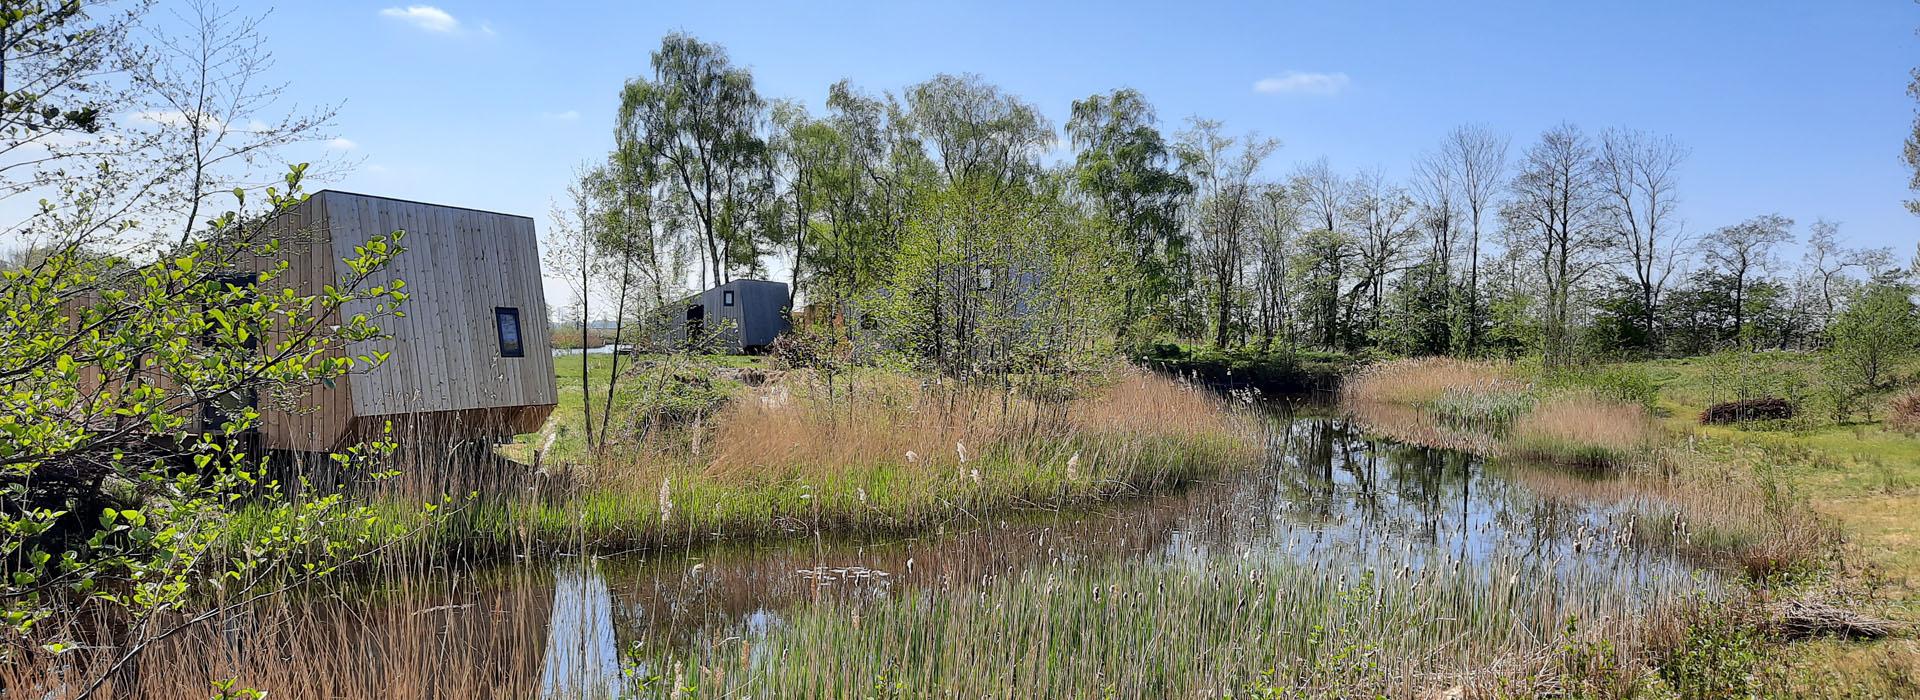 vakantie - friesland - vakantiepark - Ljeppershiem - tiny house - tuinhuisje - natuur